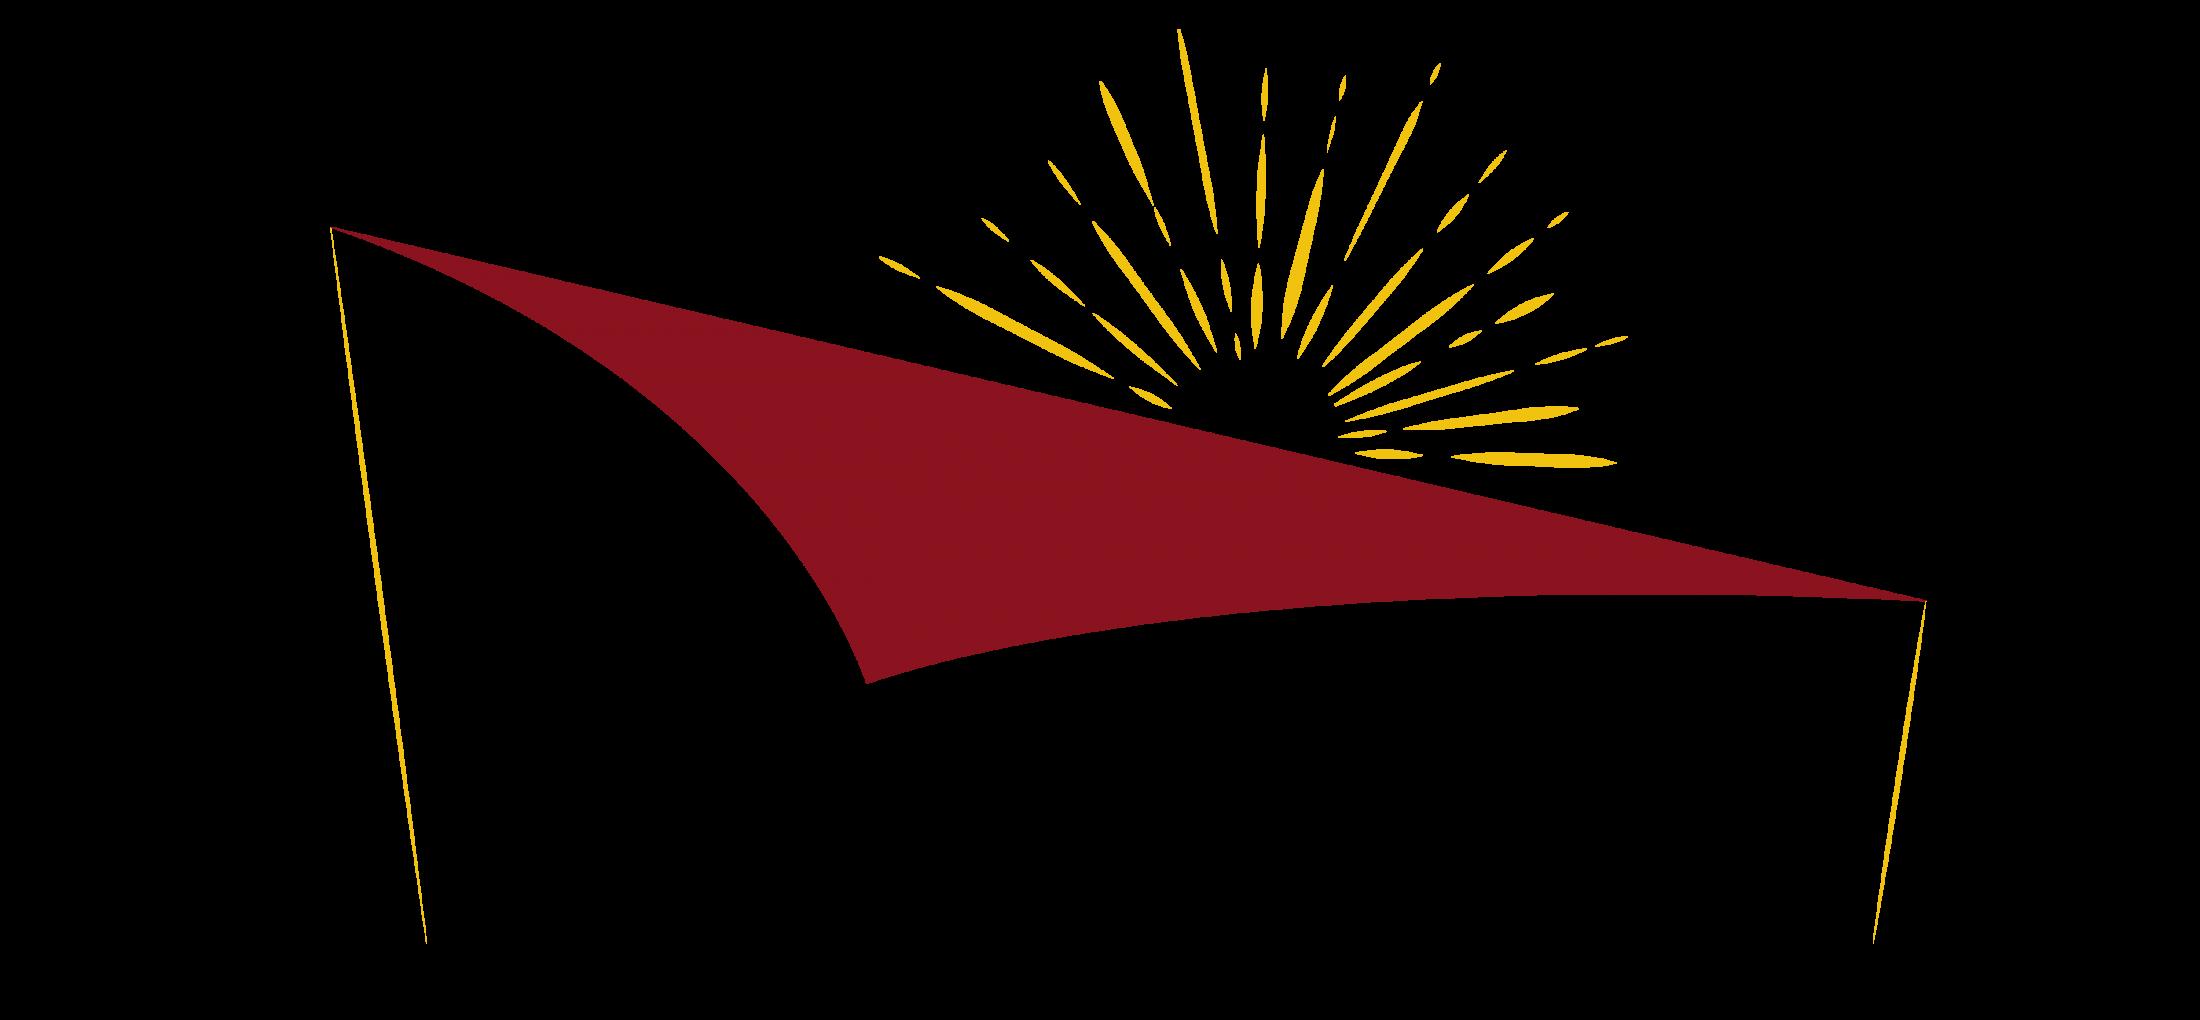 itzalbela voiles d'ombragees au pays basque